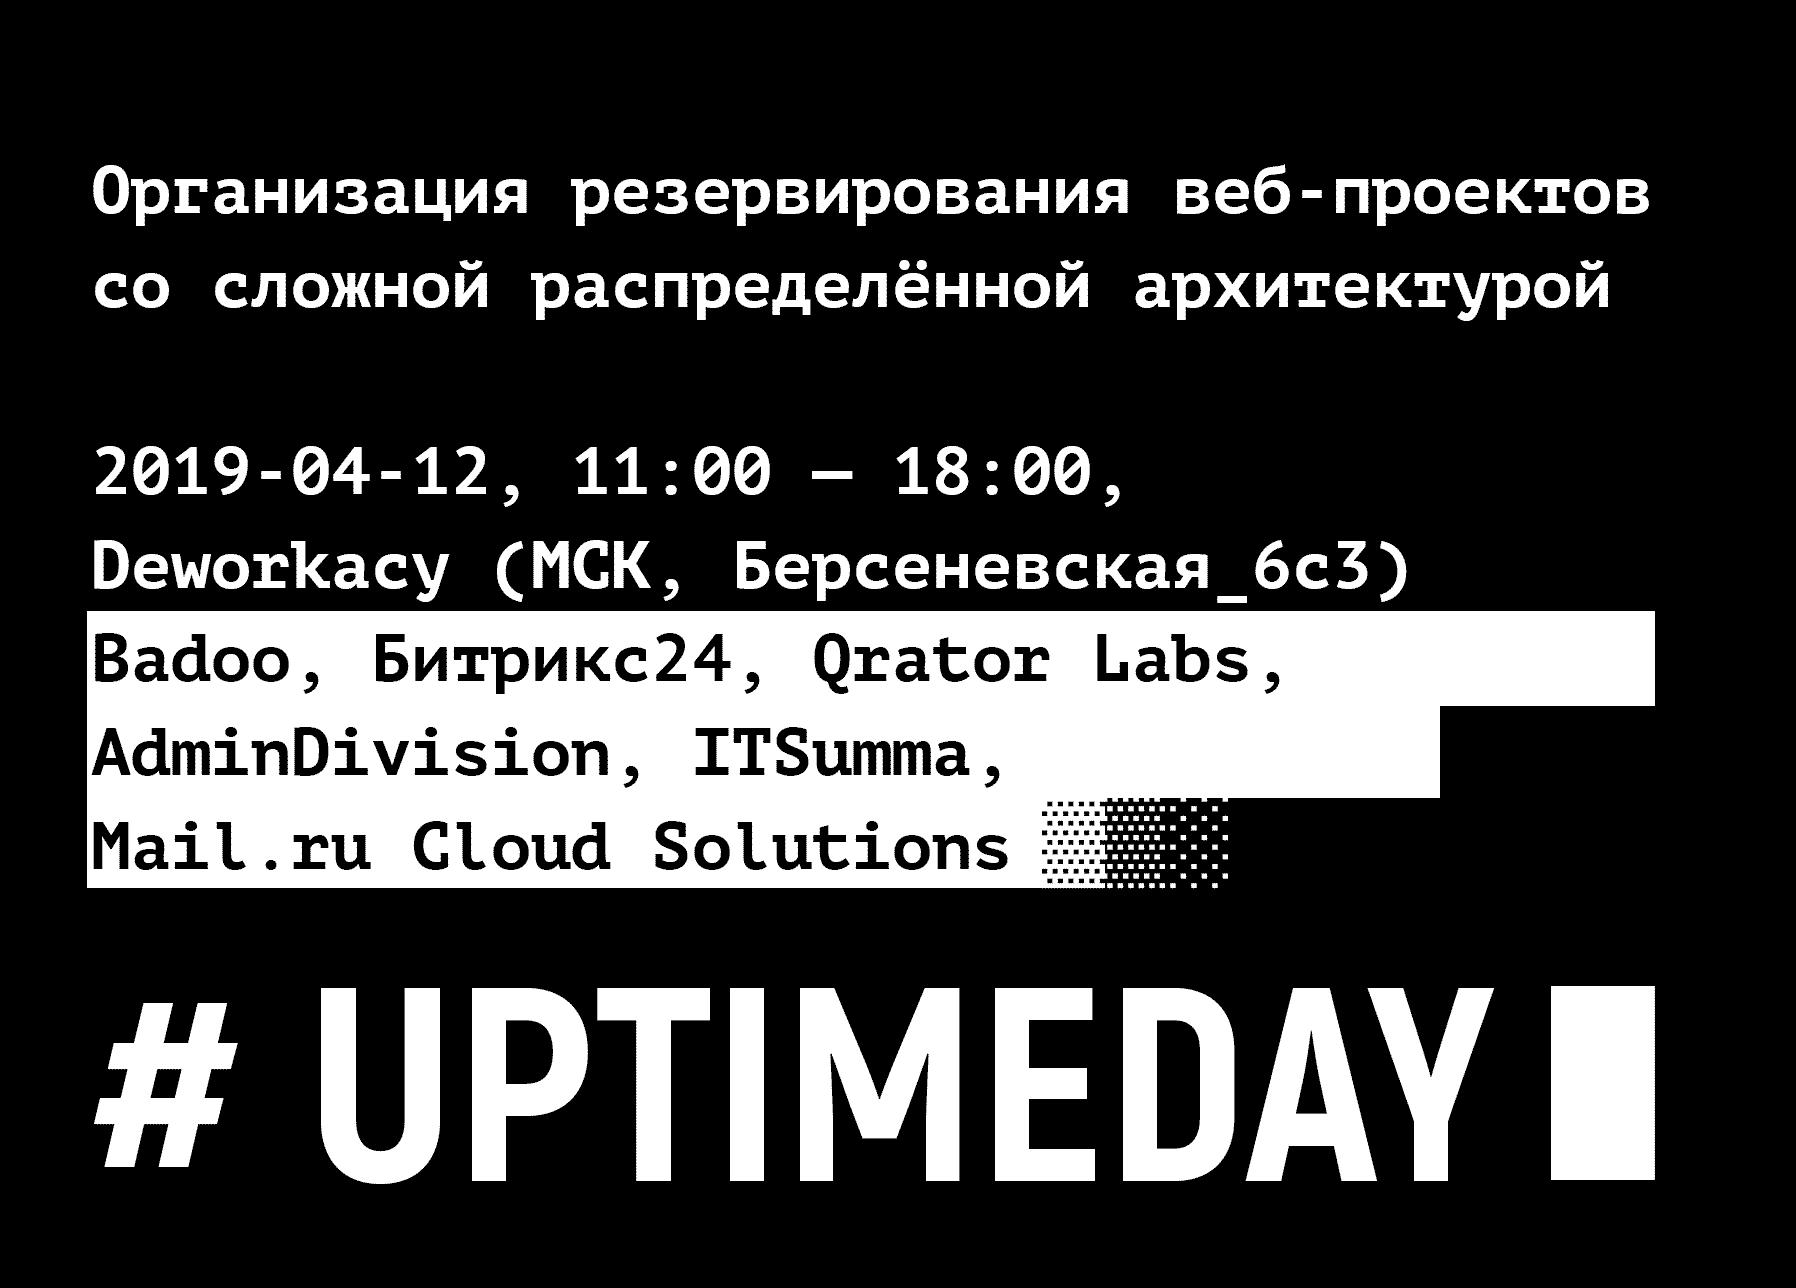 Uptime day: 12 апреля, полёт нормальный - 1